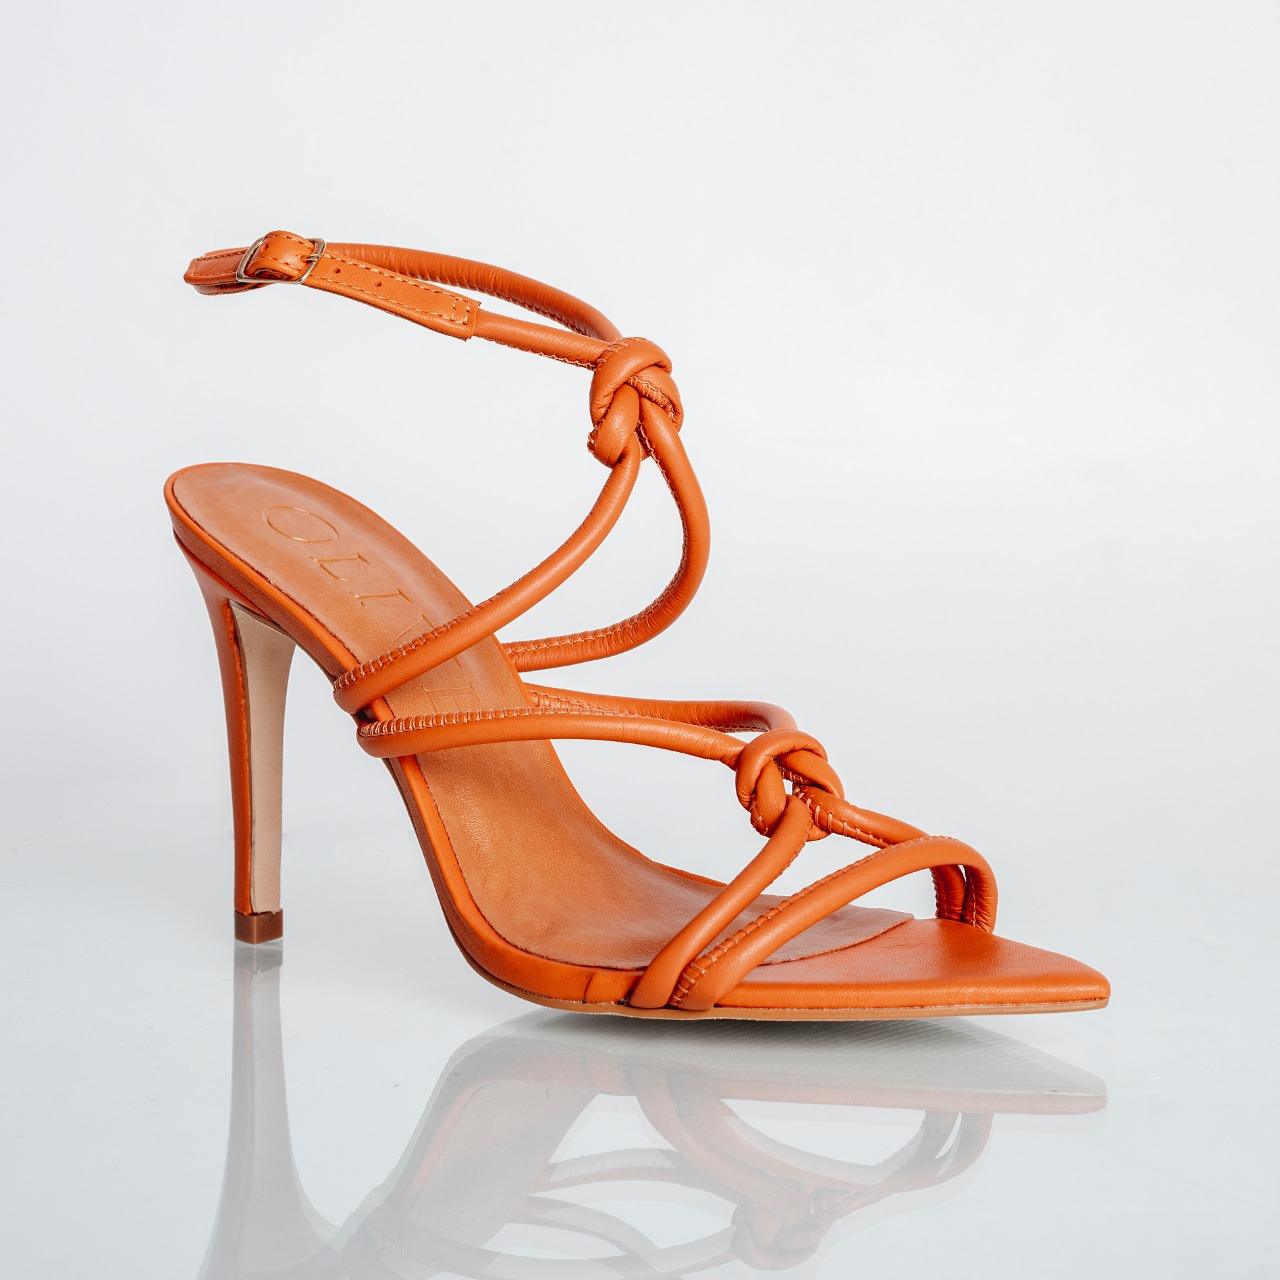 Sandália Salto Fino Bico Folha Nó Veneto Tangerina